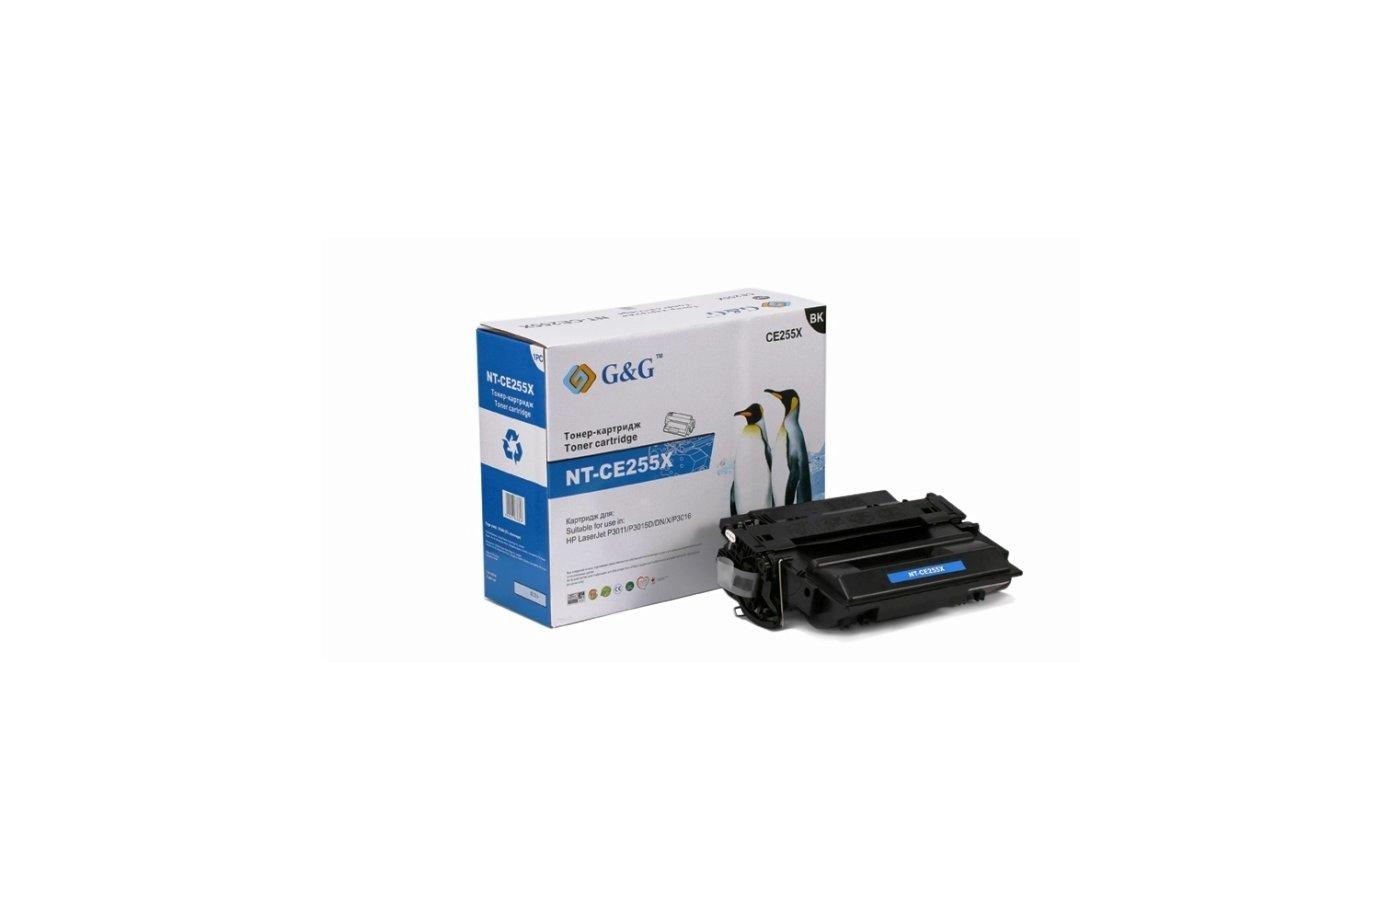 Картридж лазерный GG NT-CE255X Совместимый для HP LaserJet P3011/P3015/P3016 (12500стр)